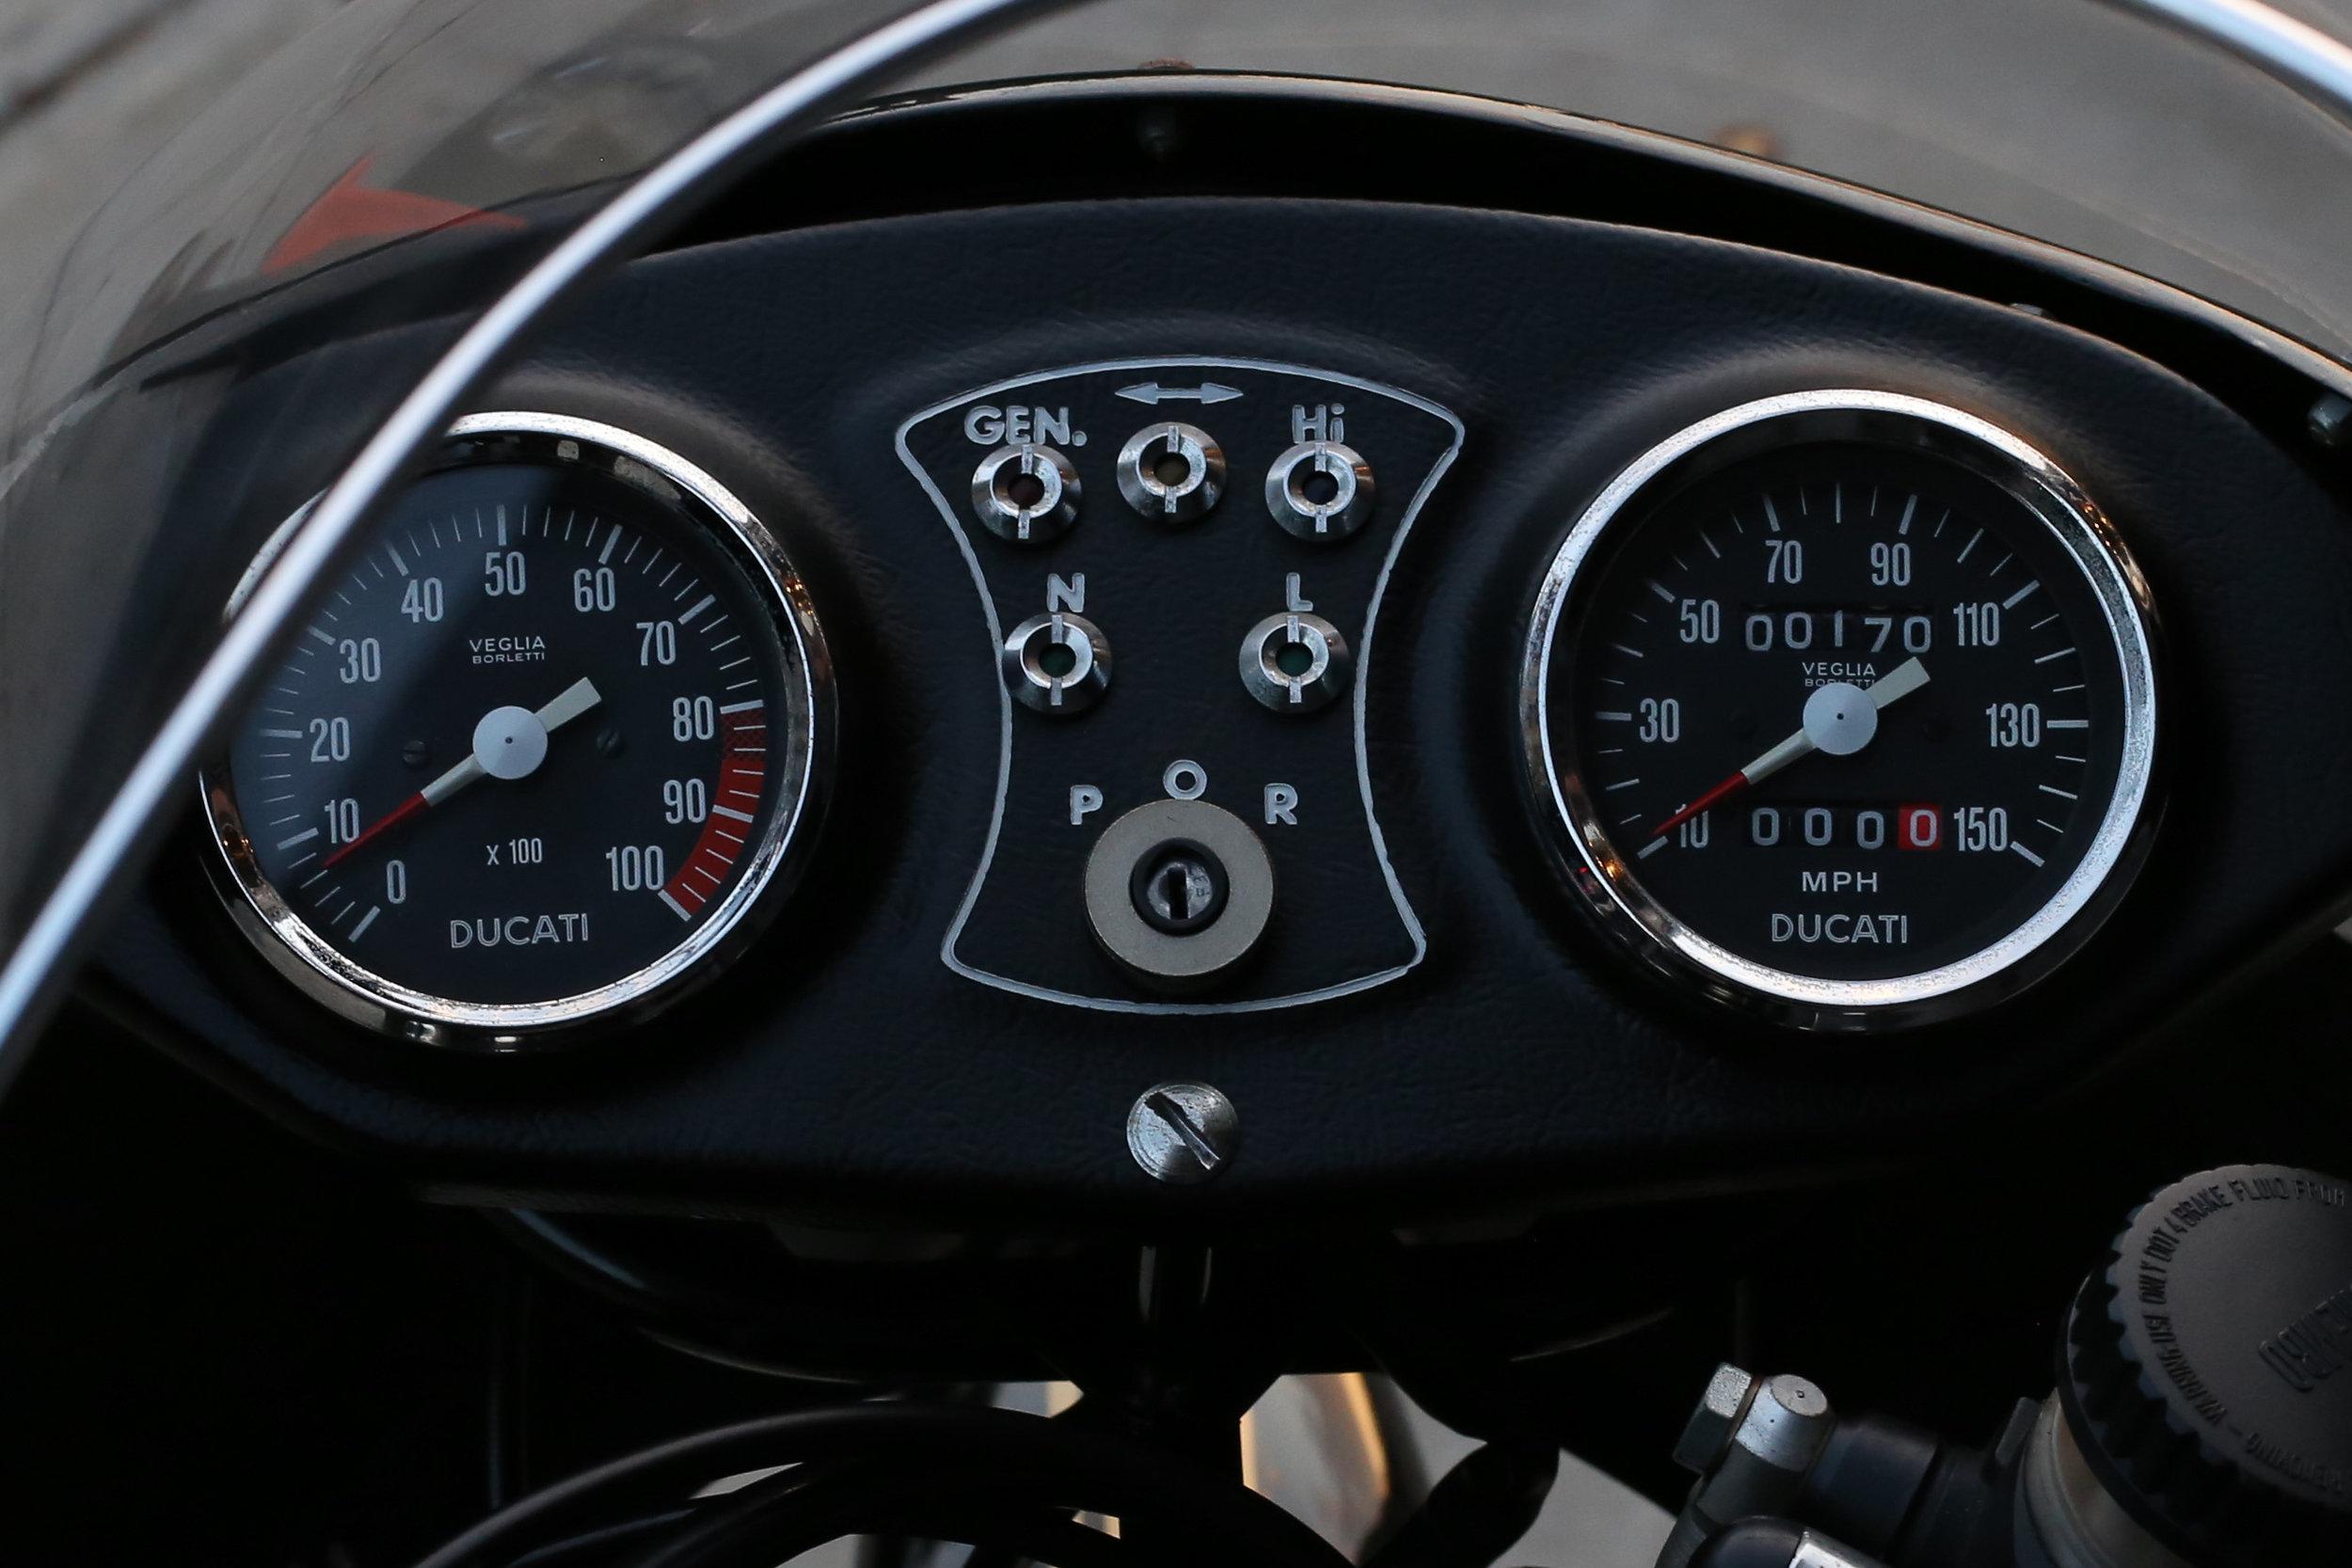 1981 Ducati 900SS gauges